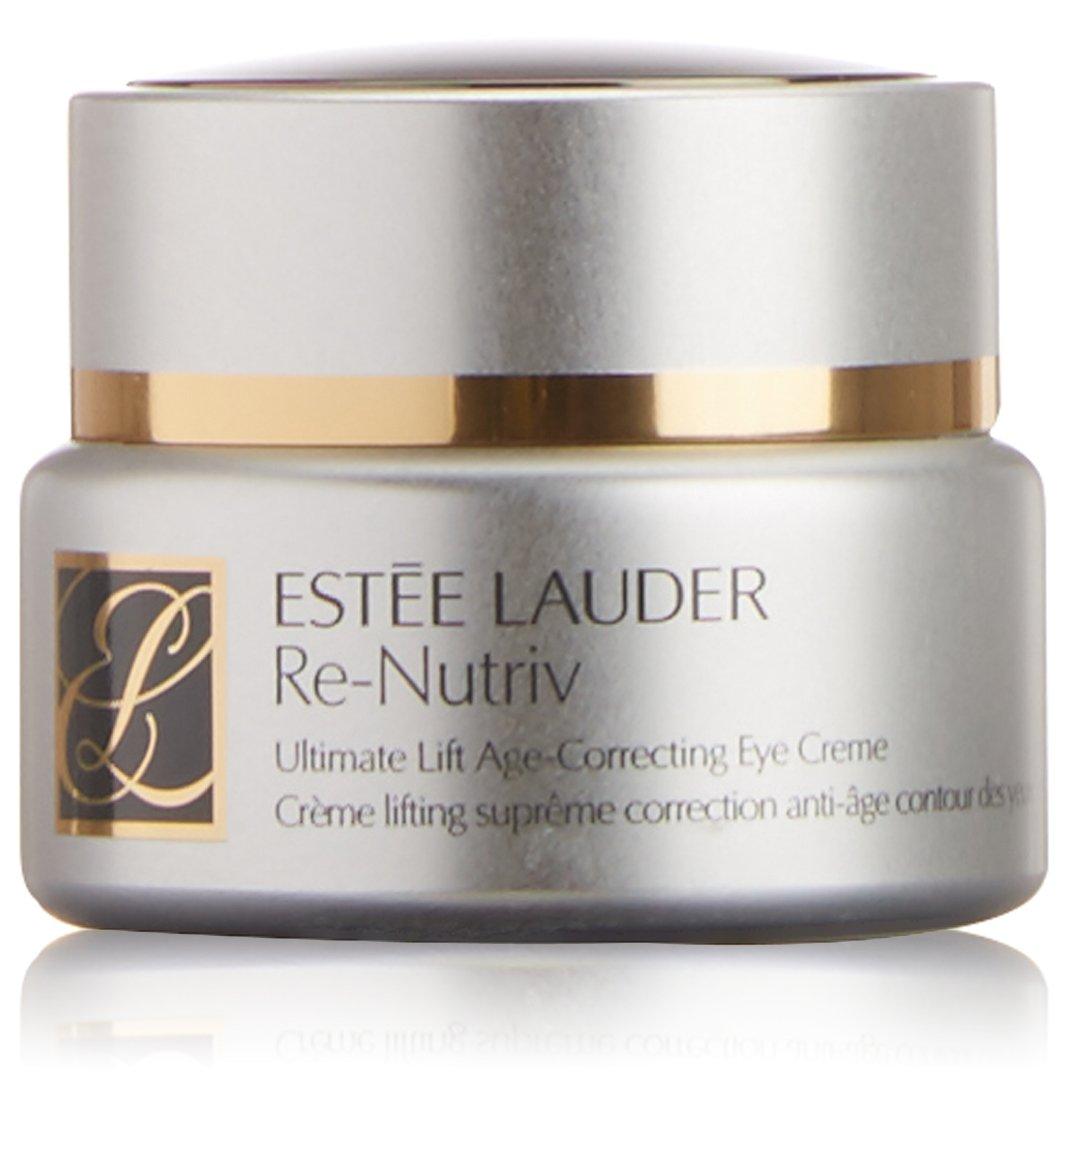 Estee Lauder Re-Nutriv Ultimate Lift Age-Correcting Eye Creme for Unisex, 0.5 Ounce